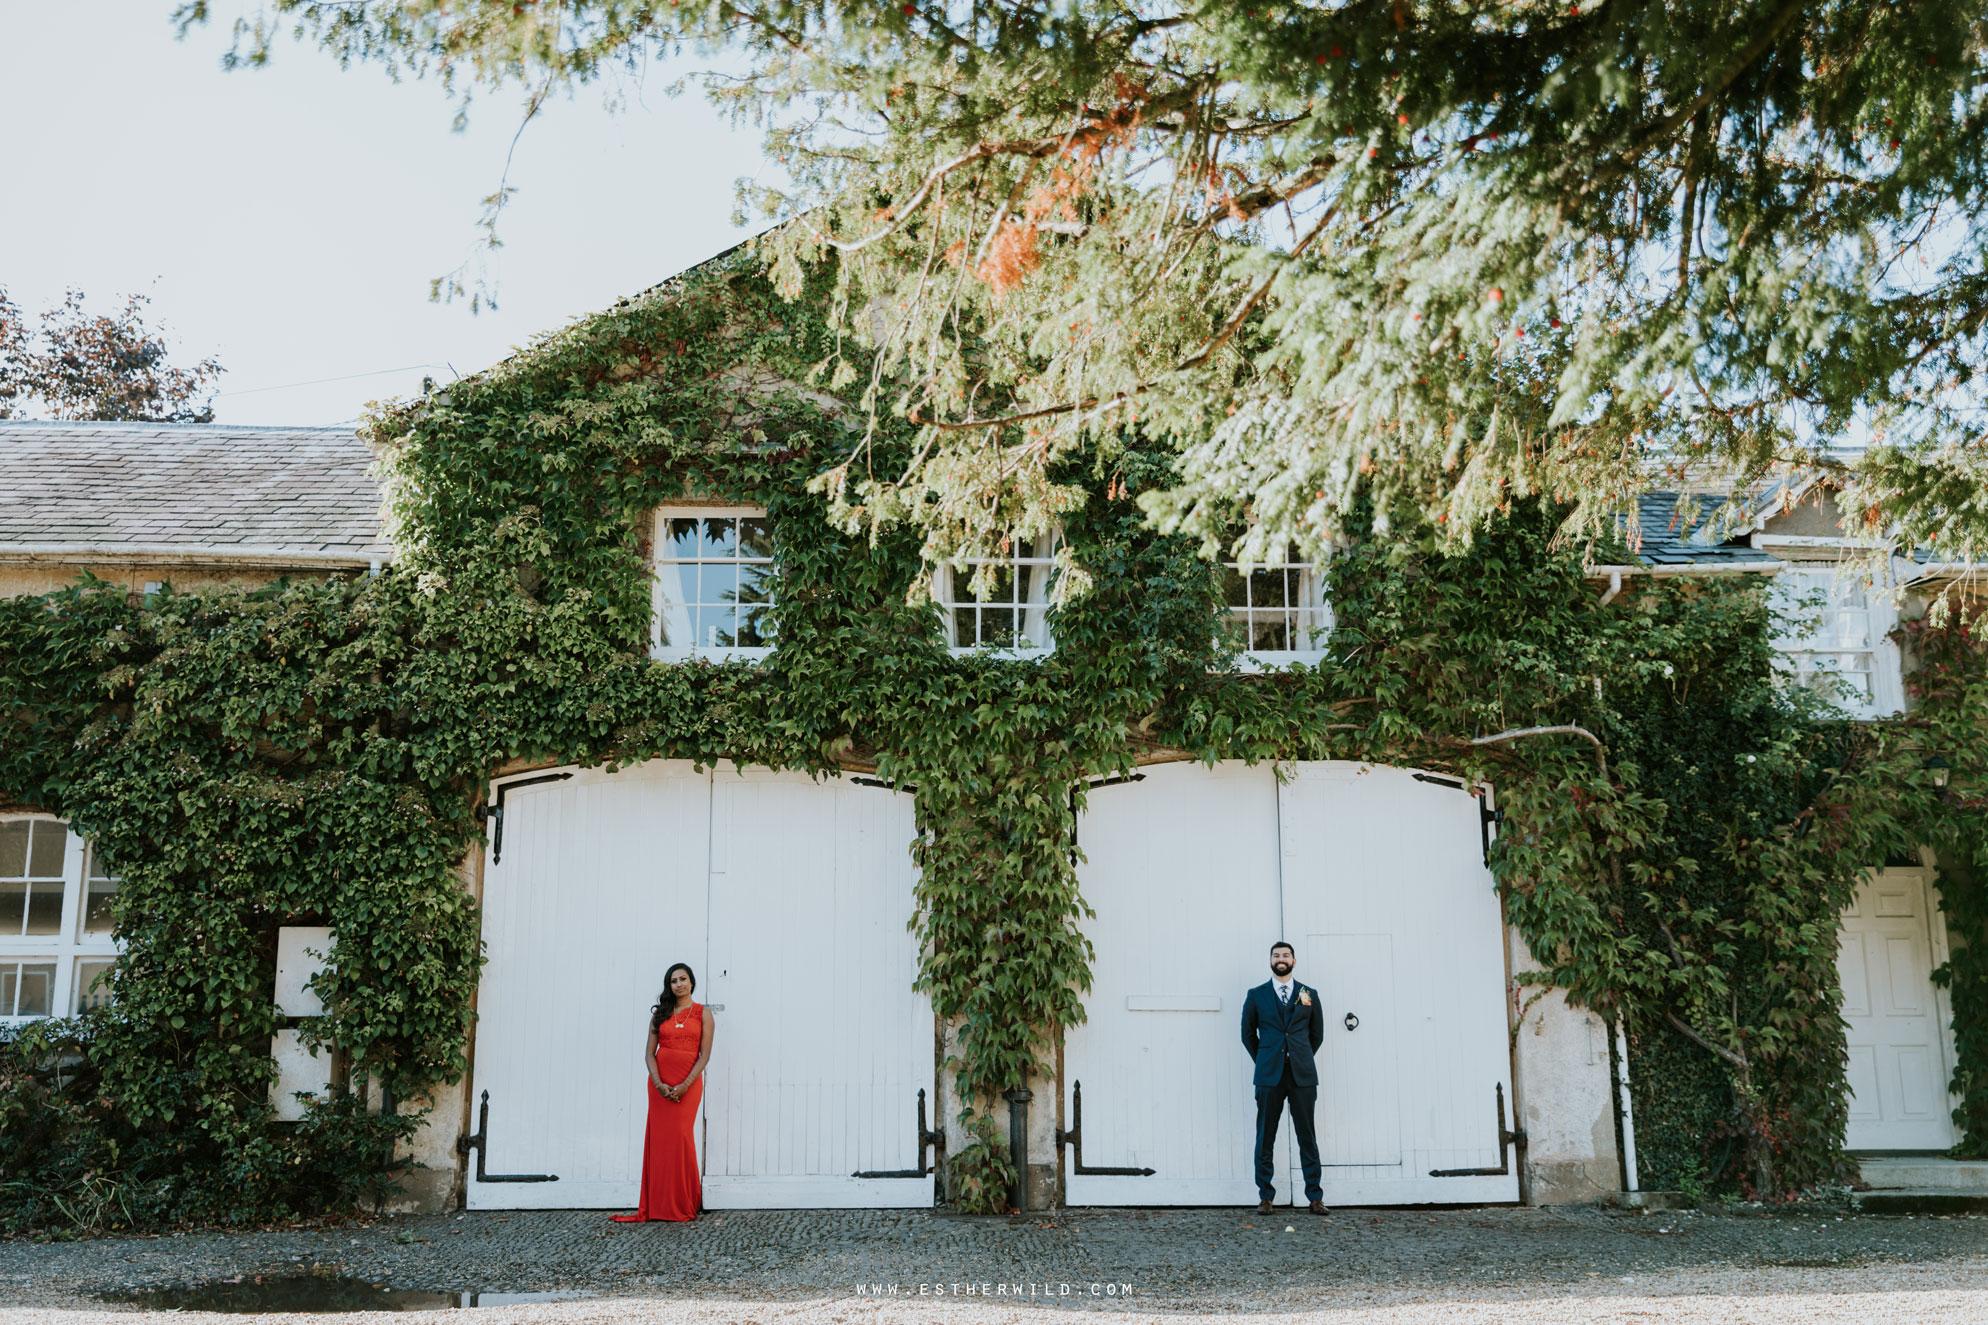 Northbrook_Park_Farnham_Surrey_London_Wedding_Hindu_Fusion_Esther_Wild_Photographer_IMG_5551.jpg